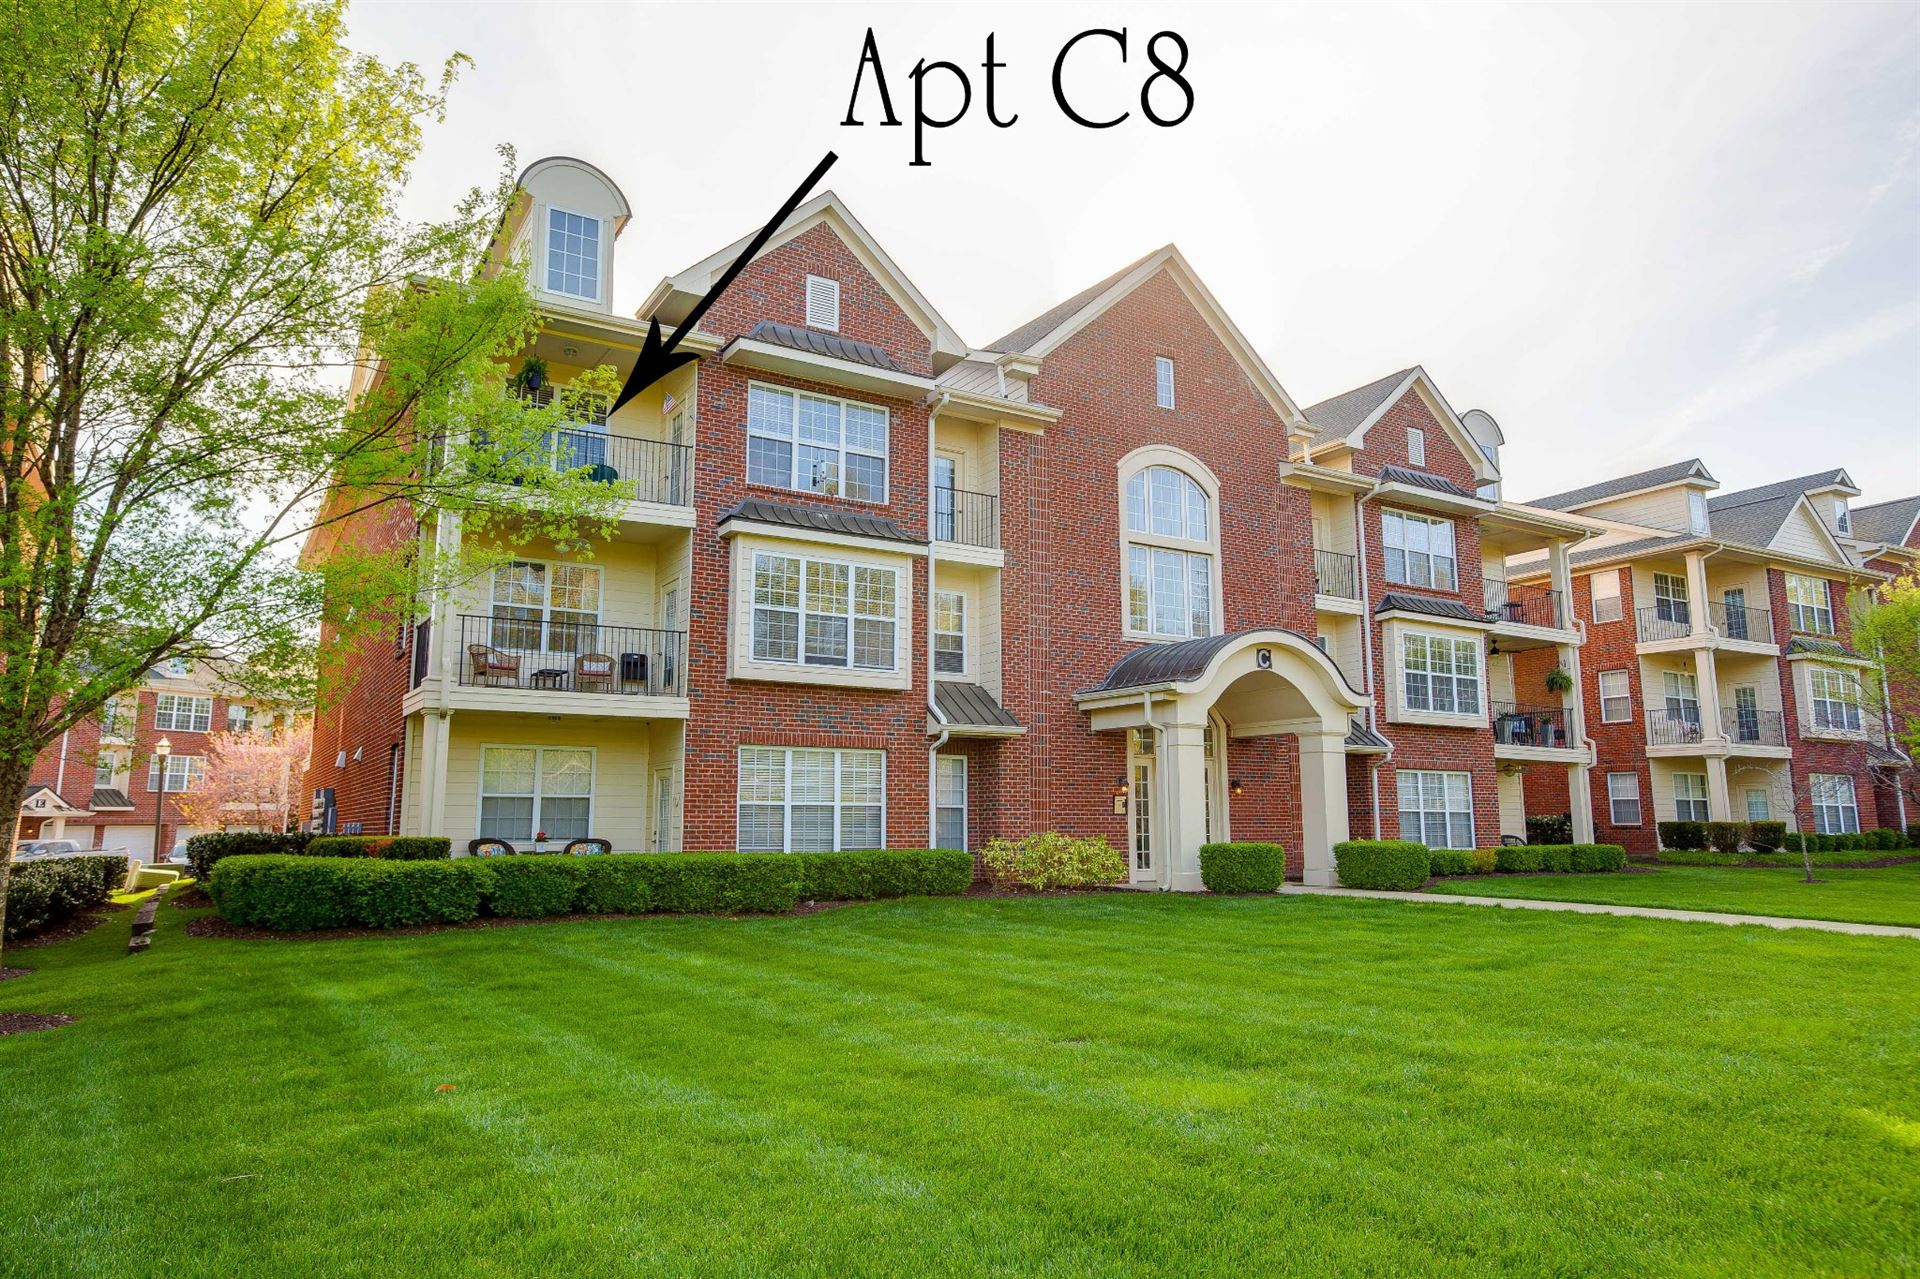 Photo of 3201 Aspen Grove Dr #C8, Franklin, TN 37067 (MLS # 2246714)